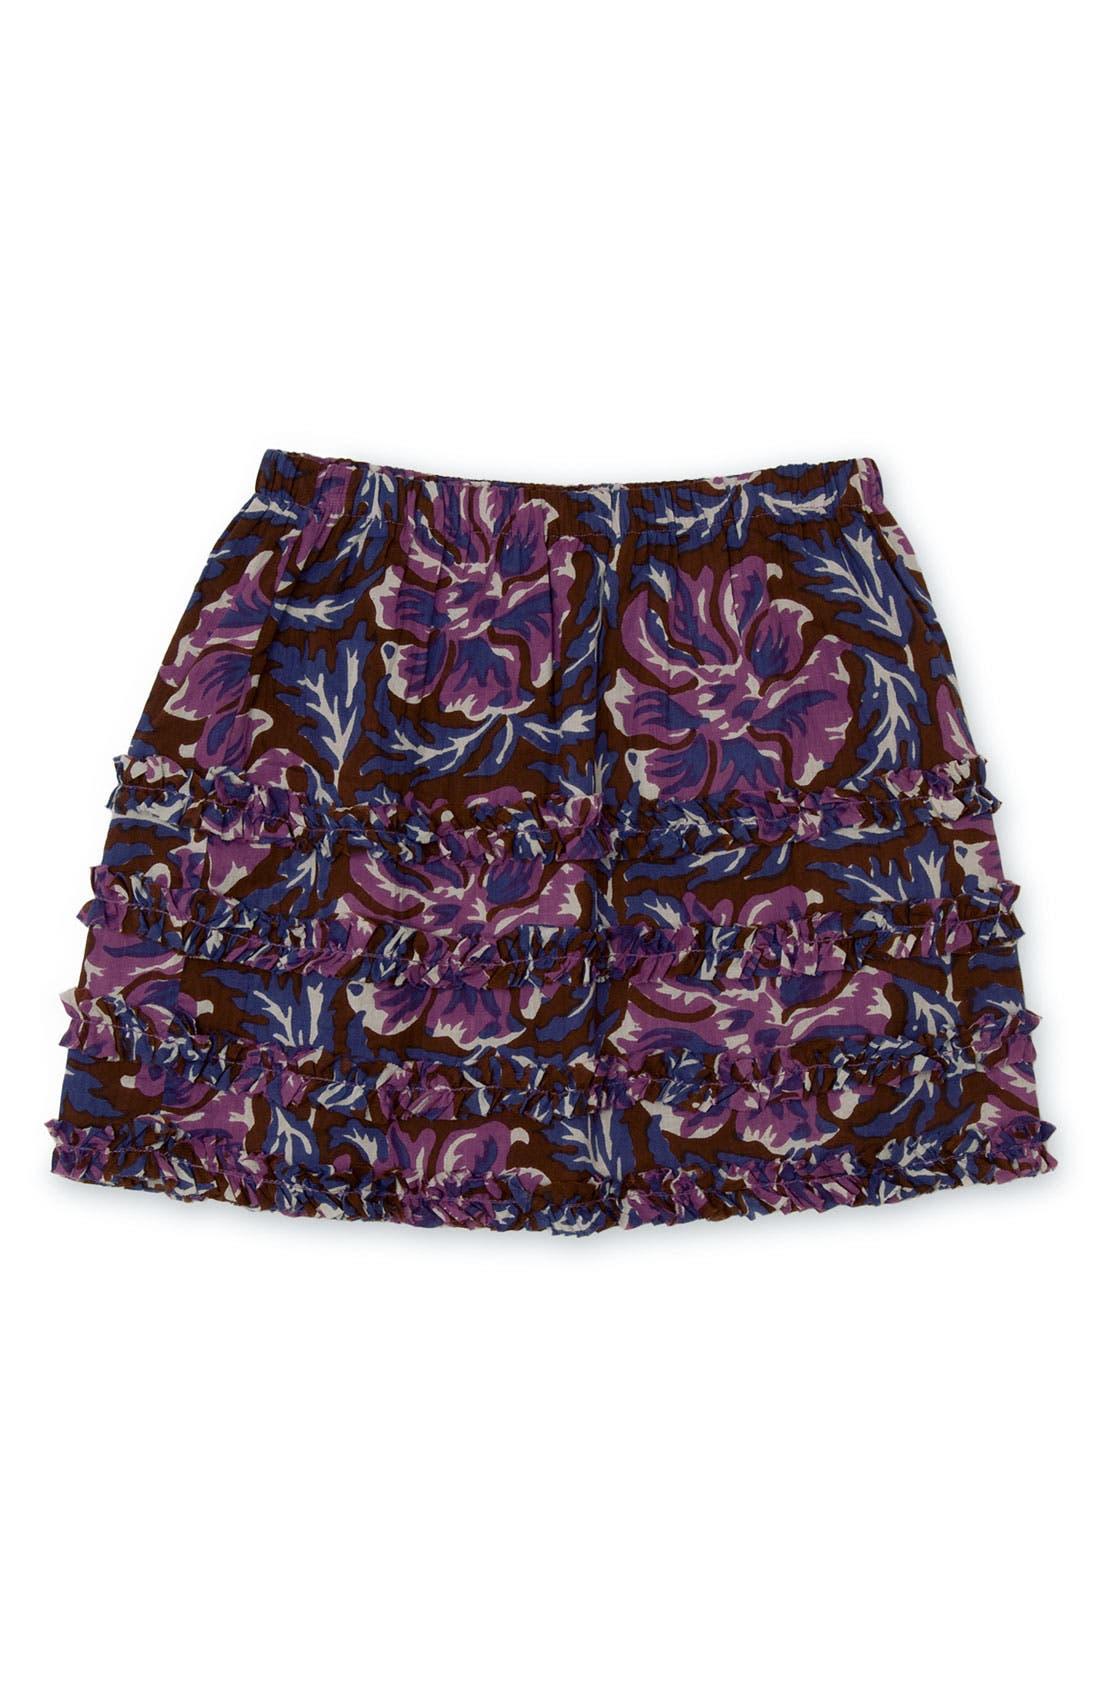 Main Image - Peek 'Anna' Skirt (Toddler)